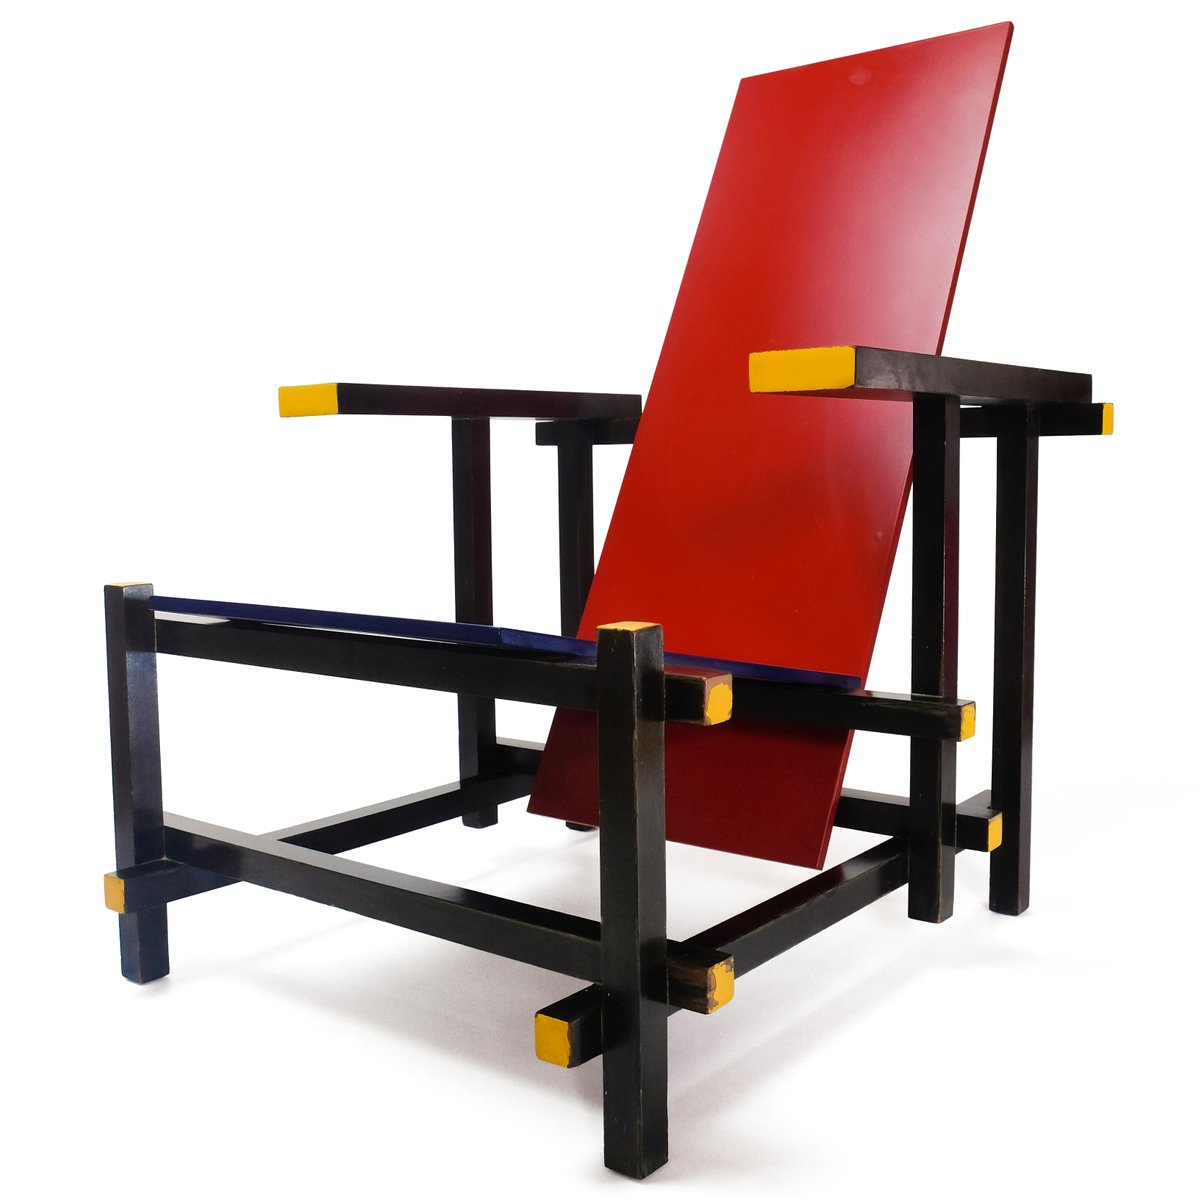 stuhl in rot blau von gerrit thomas rietveld f r cassina 1970er bei pamono kaufen. Black Bedroom Furniture Sets. Home Design Ideas